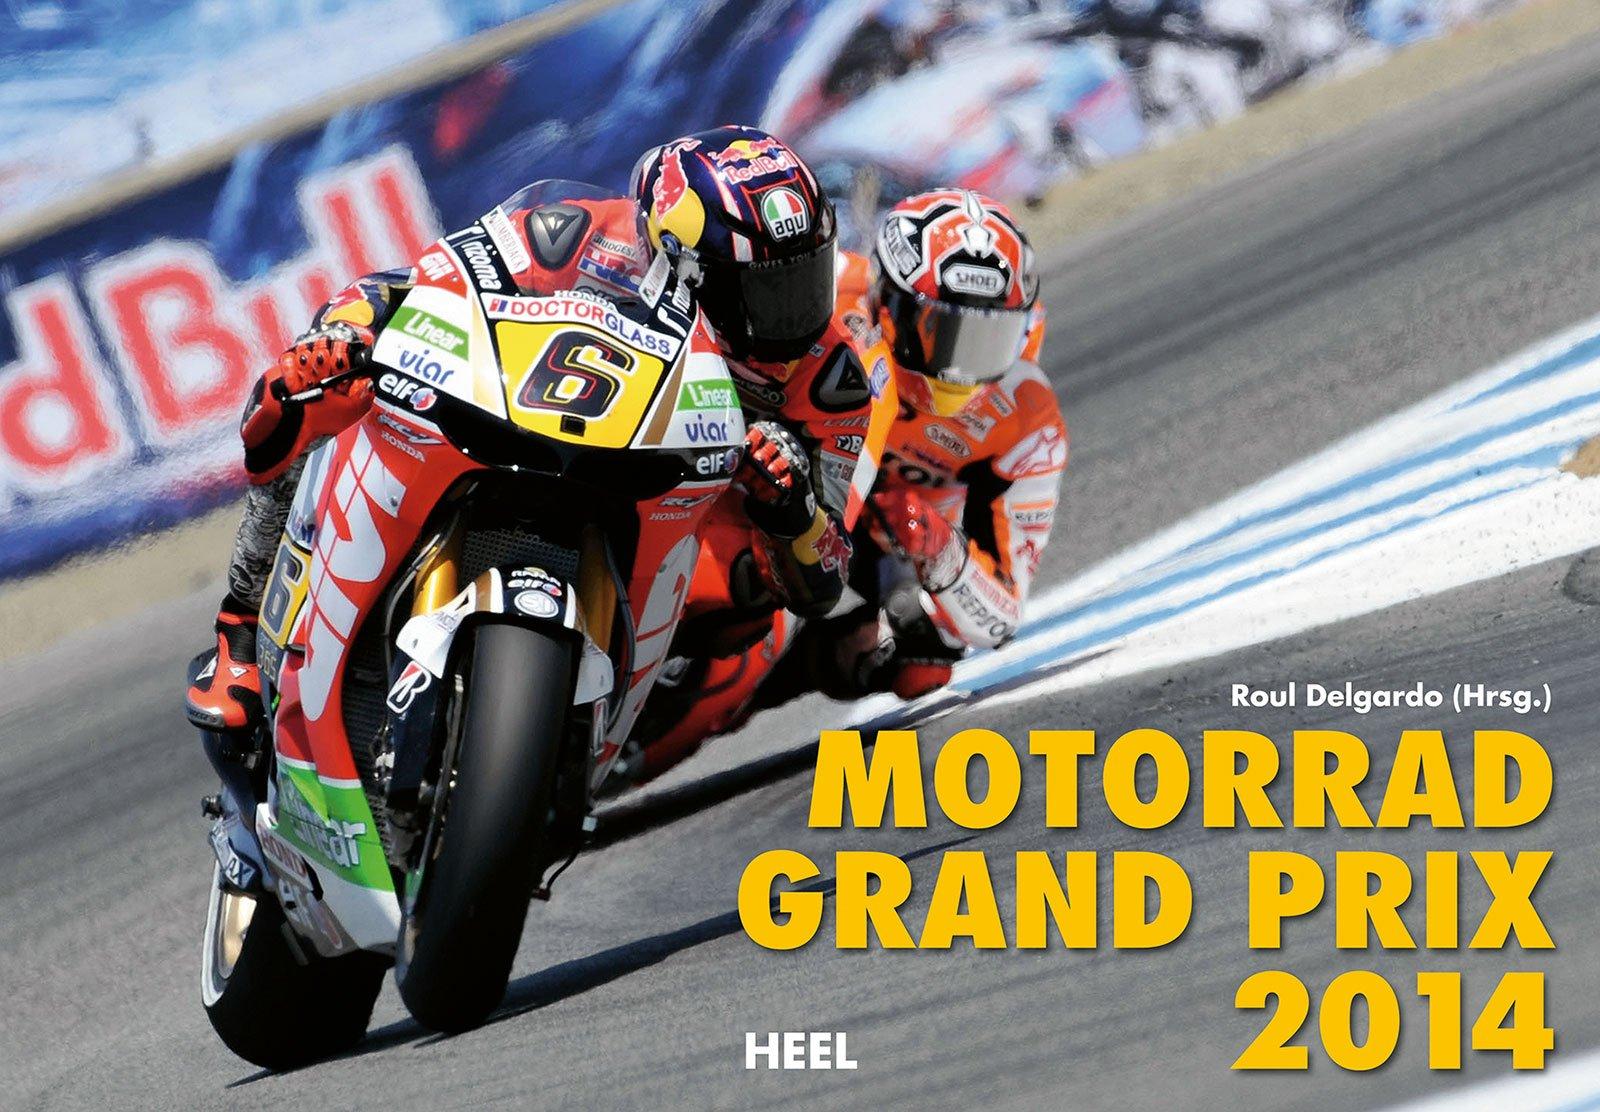 Motorrad Grand Prix 2014